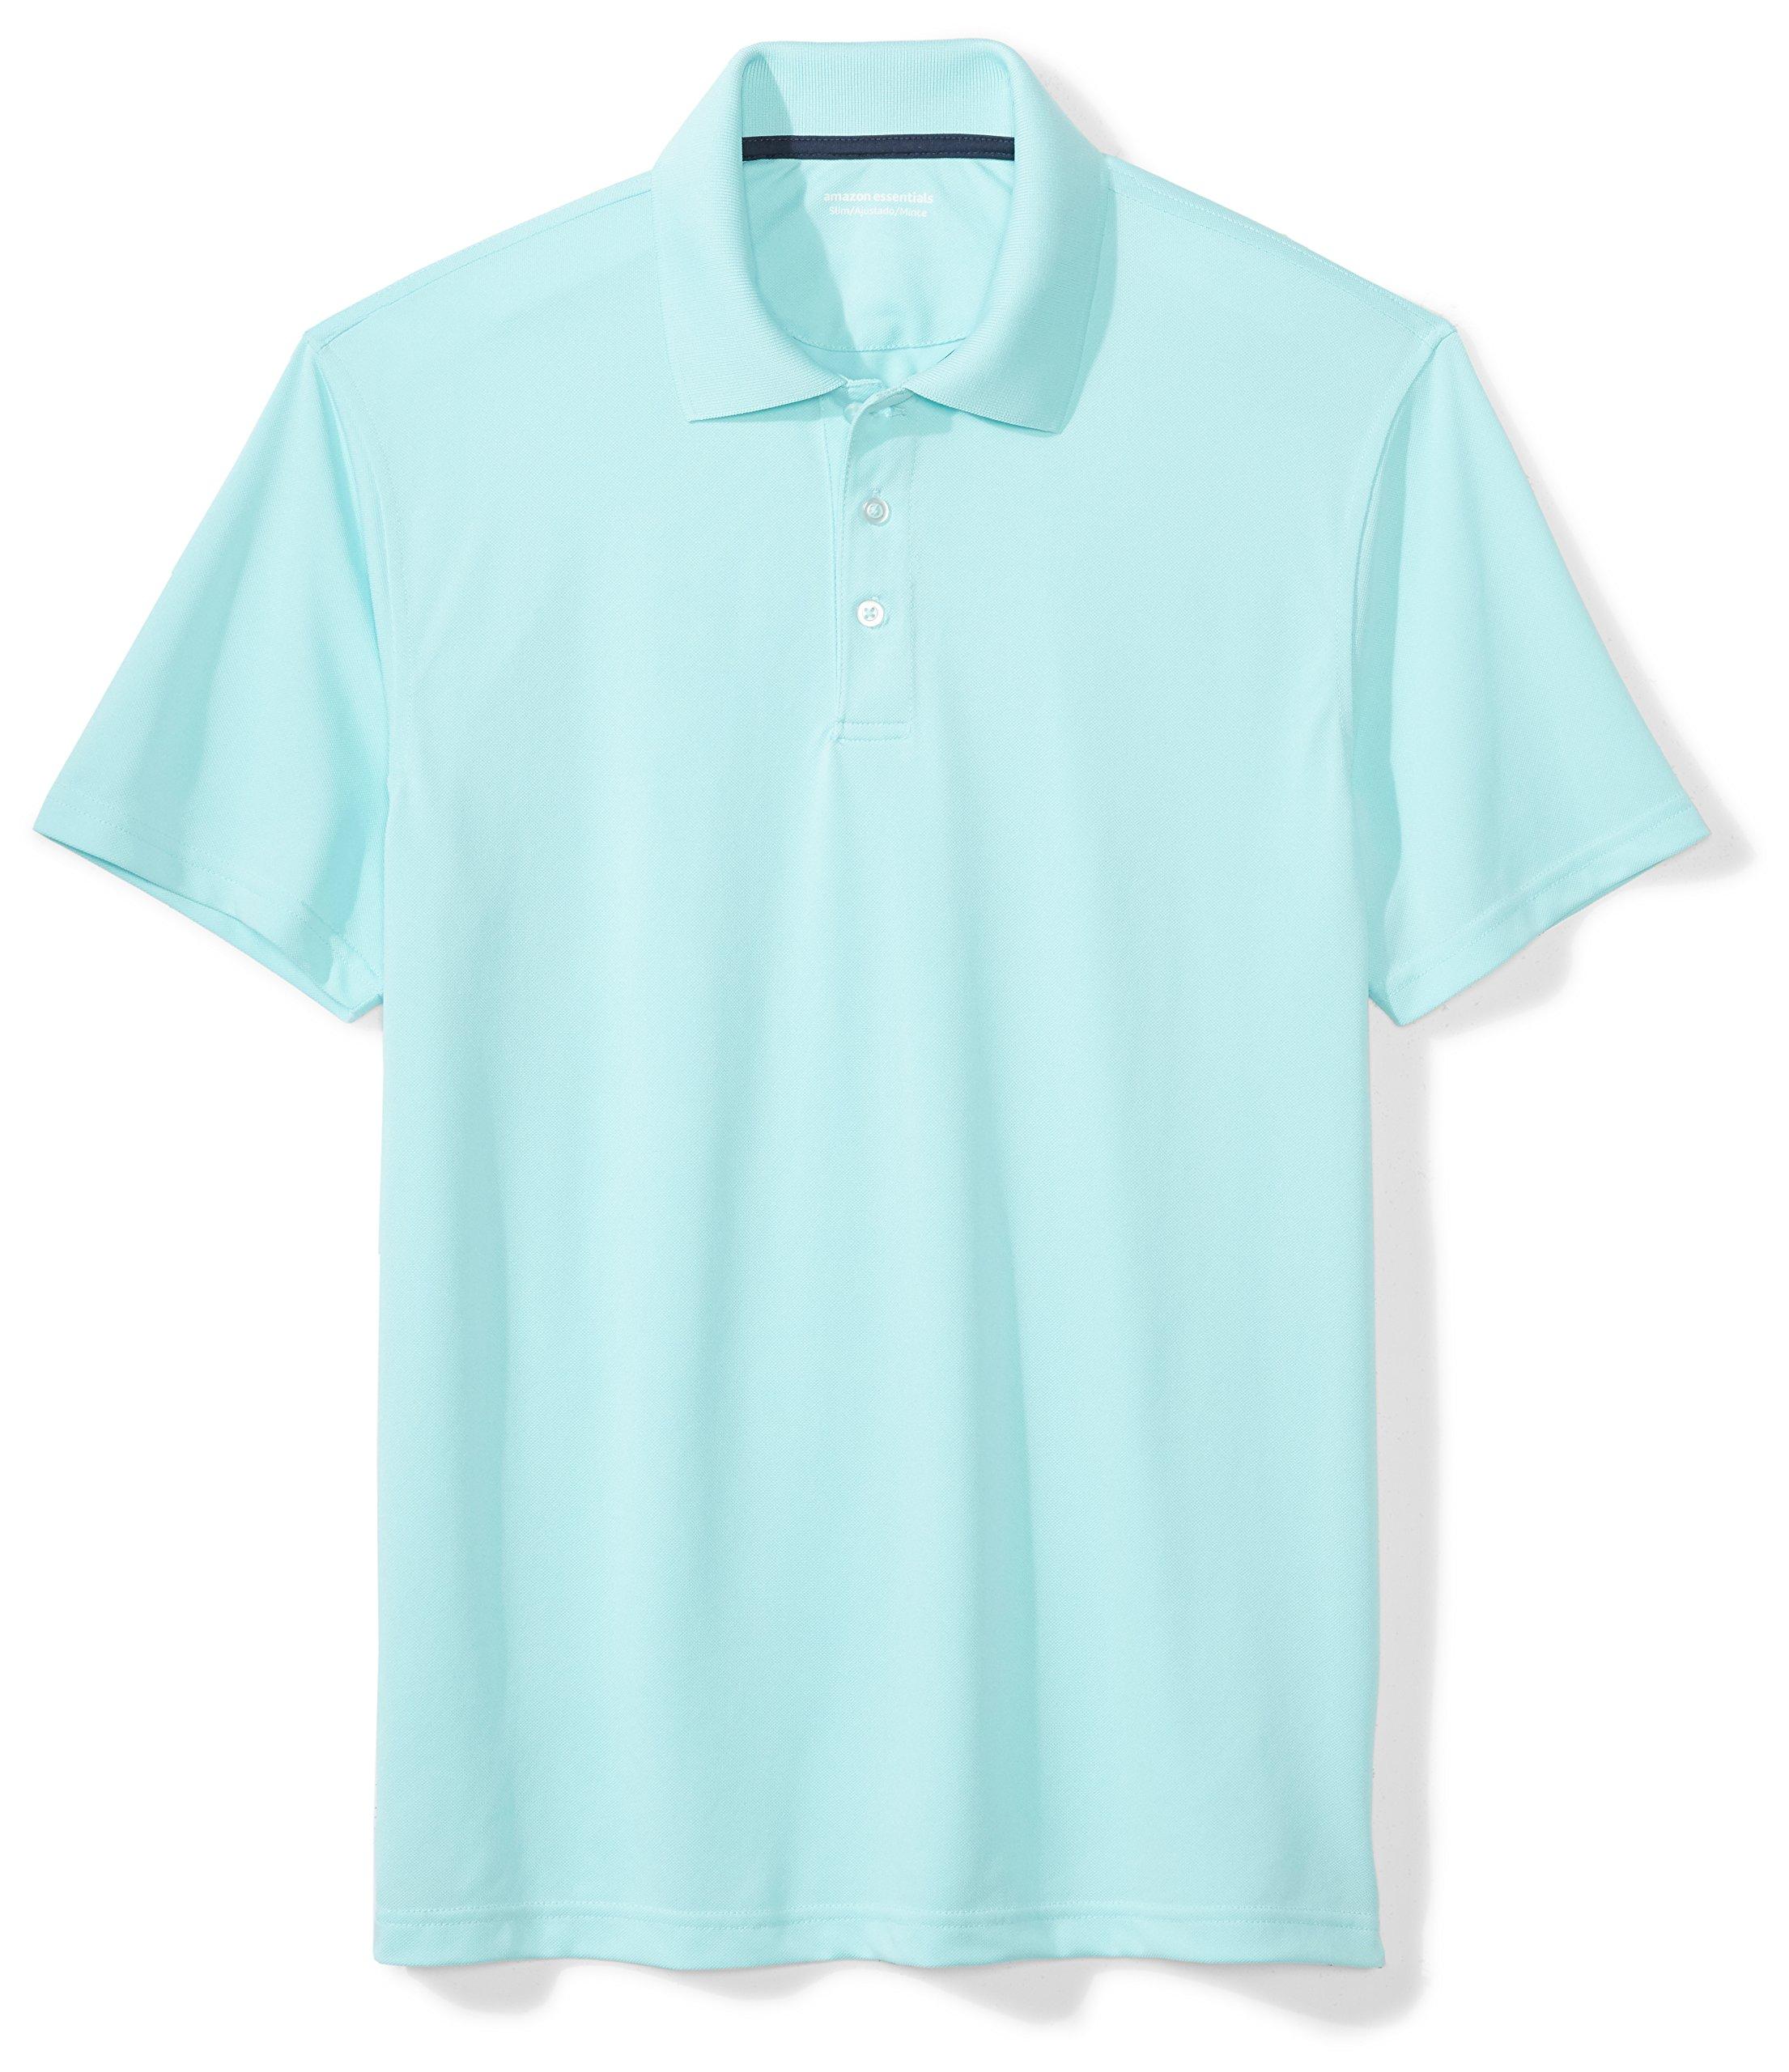 Amazon Essentials Men's Slim-Fit Quick-Dry Golf Polo Shirt, Aqua, Small by Amazon Essentials